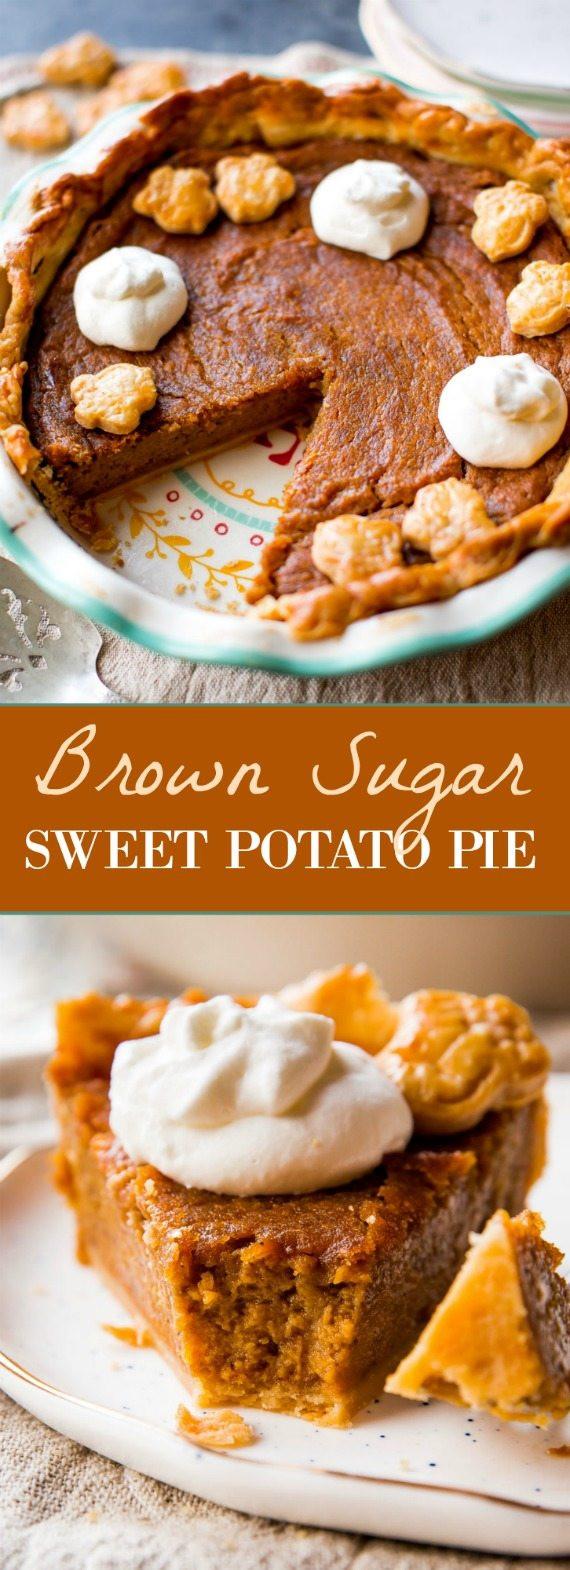 Sweet Potato Pie Thanksgiving  Brown Sugar Sweet Potato Pie Sallys Baking Addiction